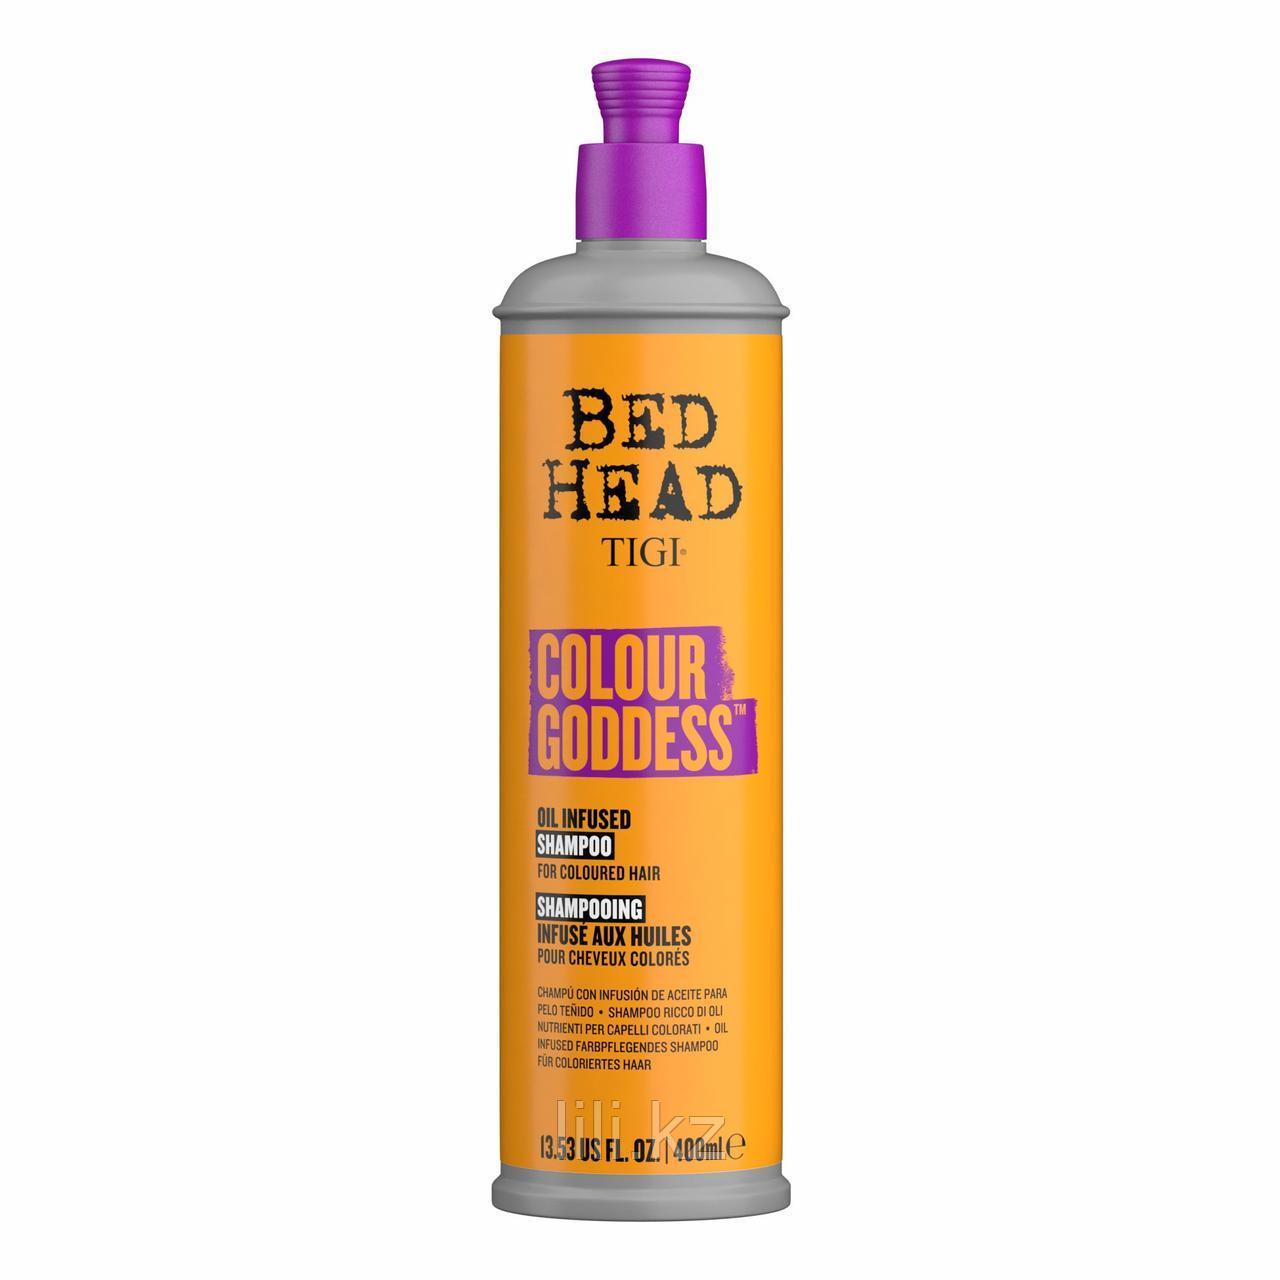 Шампунь для окрашенных волос - Tigi Bed Head Colour Goddess 400 мл.